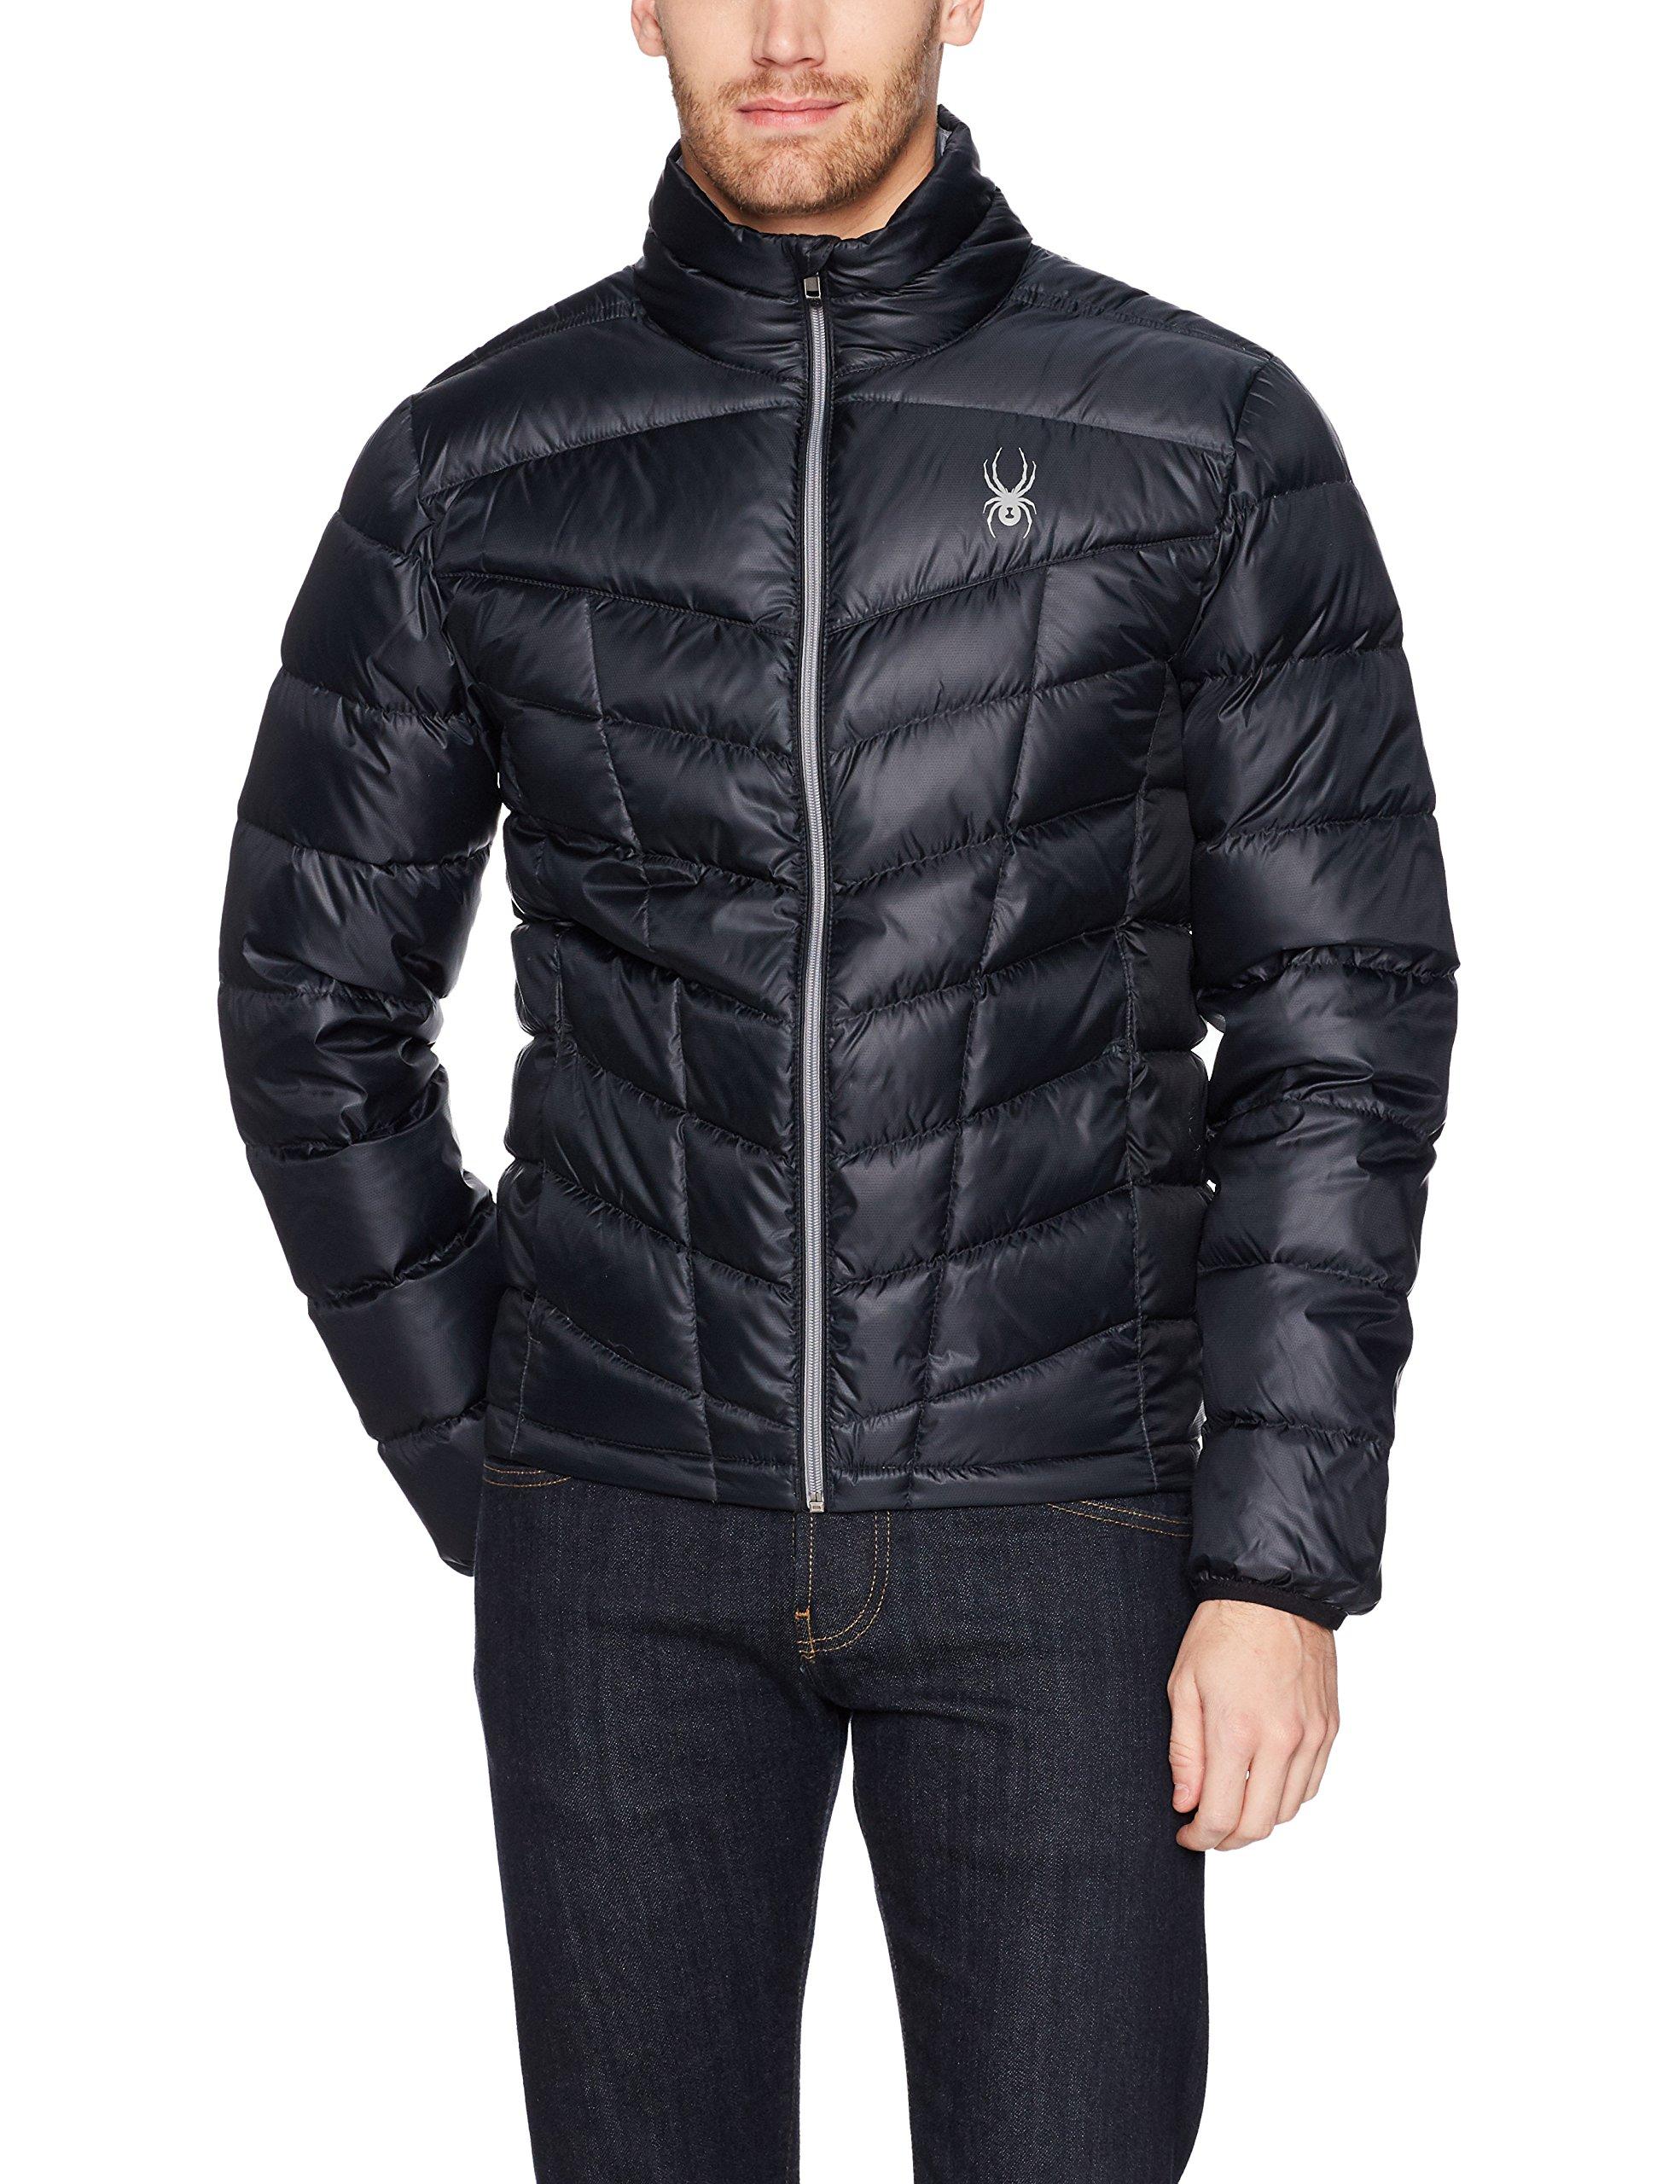 Spyder Pelmo Down Jacket, Black, X-Large